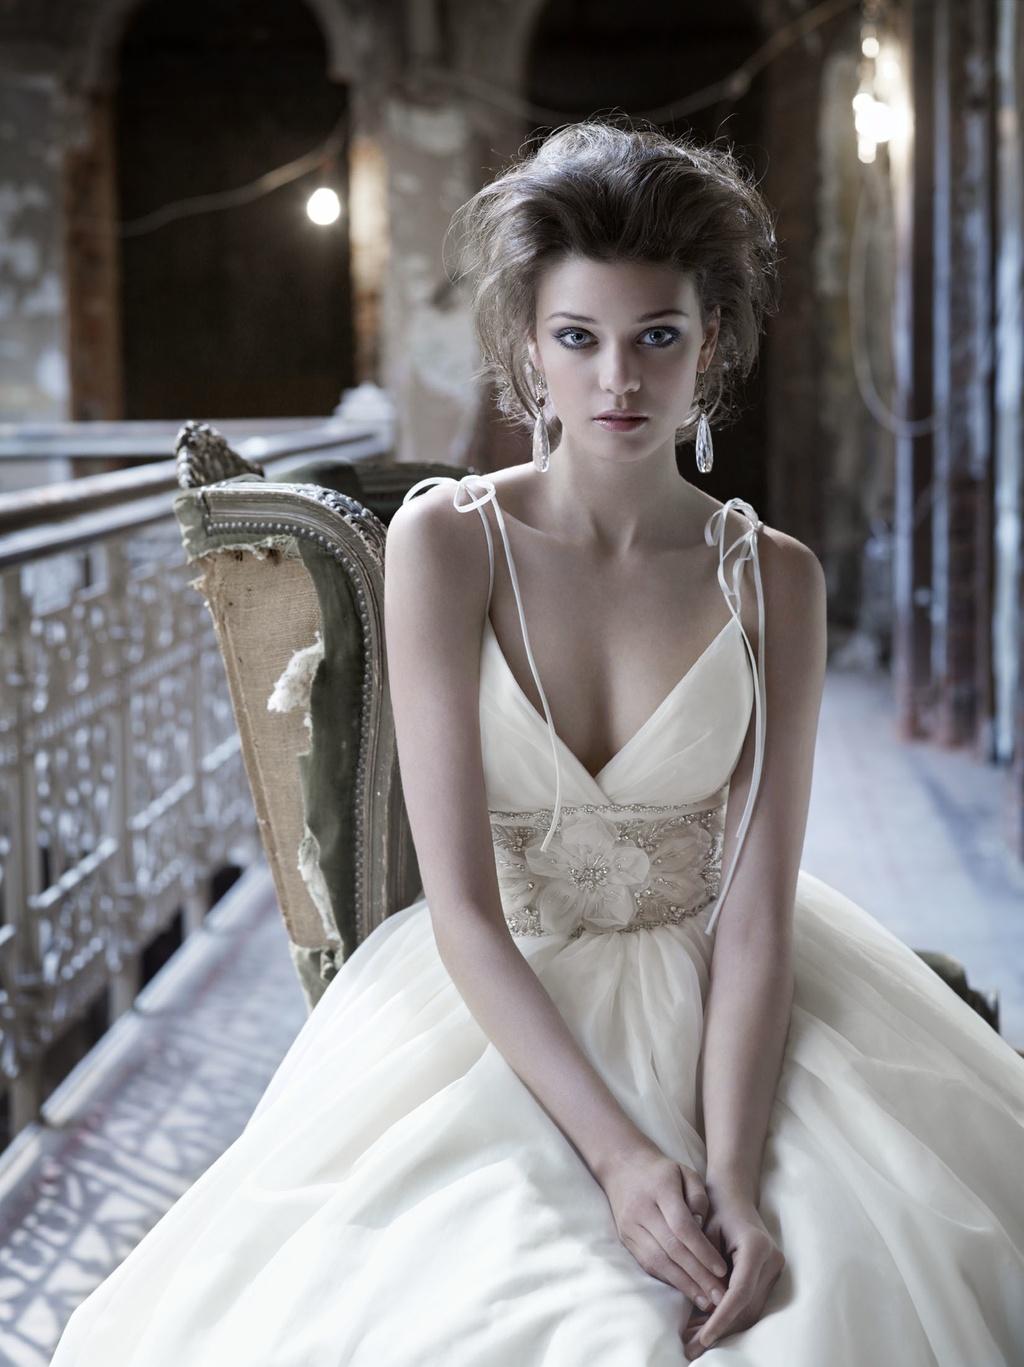 Wedding-dress-fall-2011-bridal-gowns-lazaro-3165-detail.full